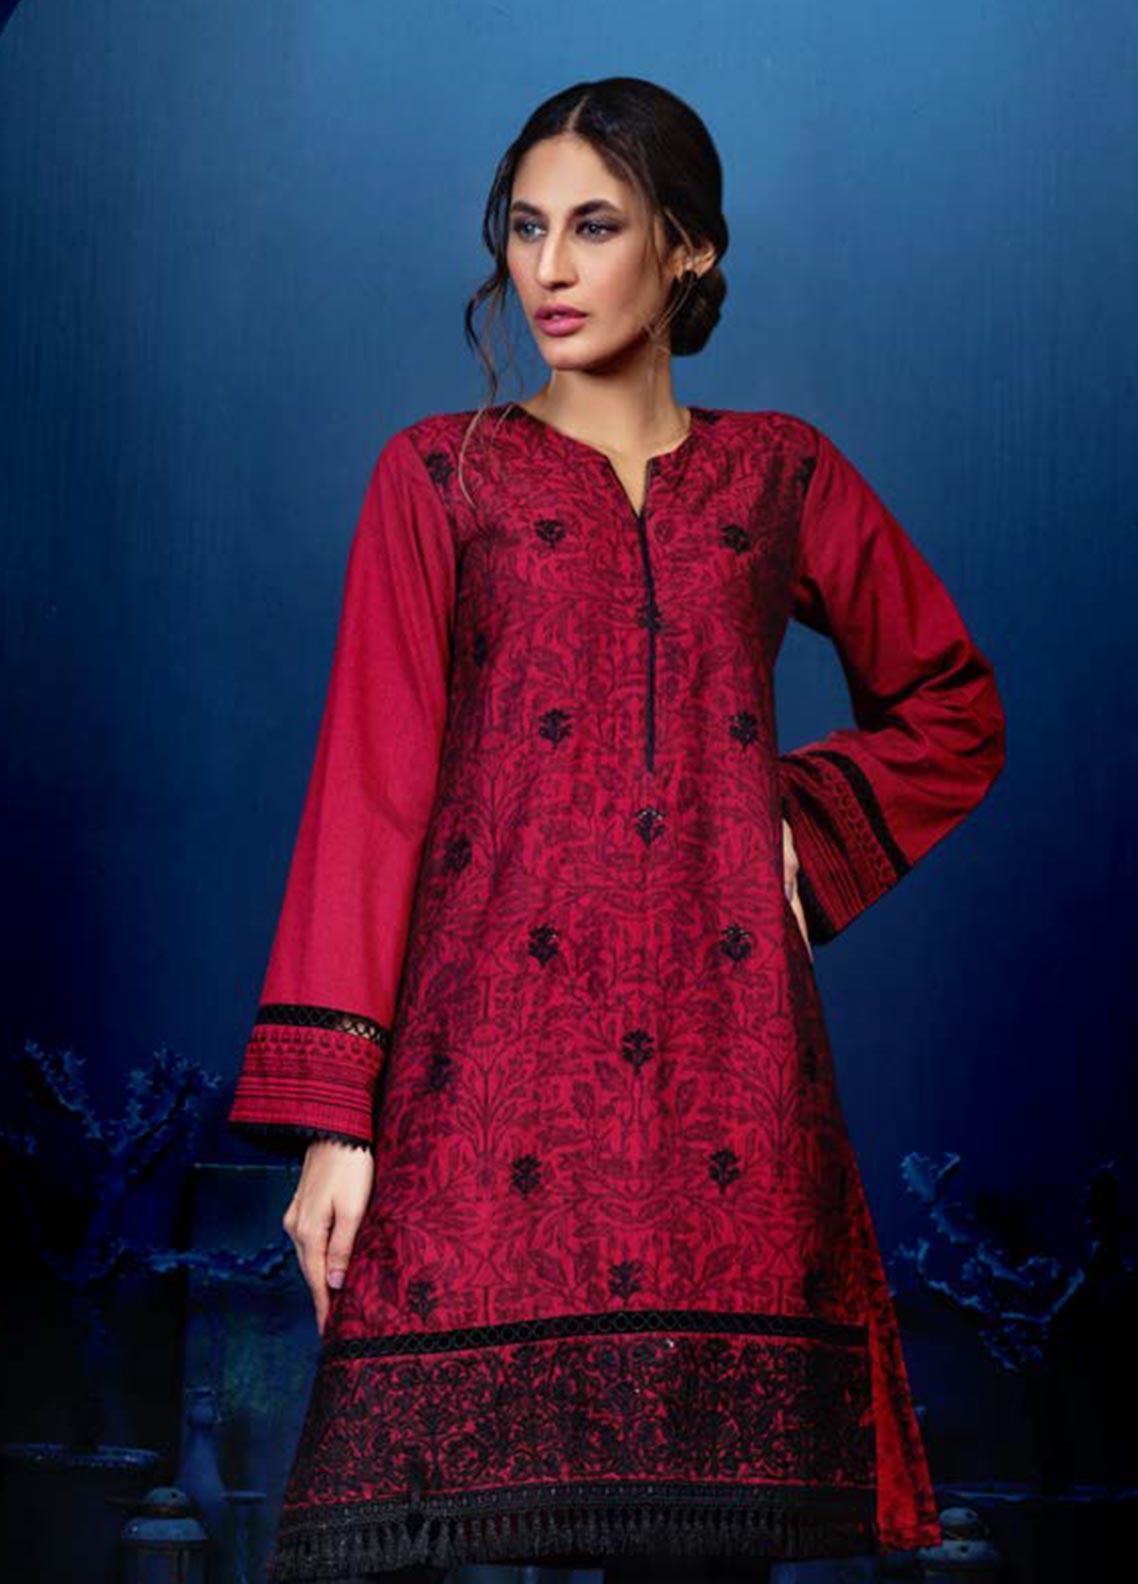 Orient Textile Embroidered Linen Unstitched Kurties OT19W 234 MOLTEN LAVA A - Winter Collection